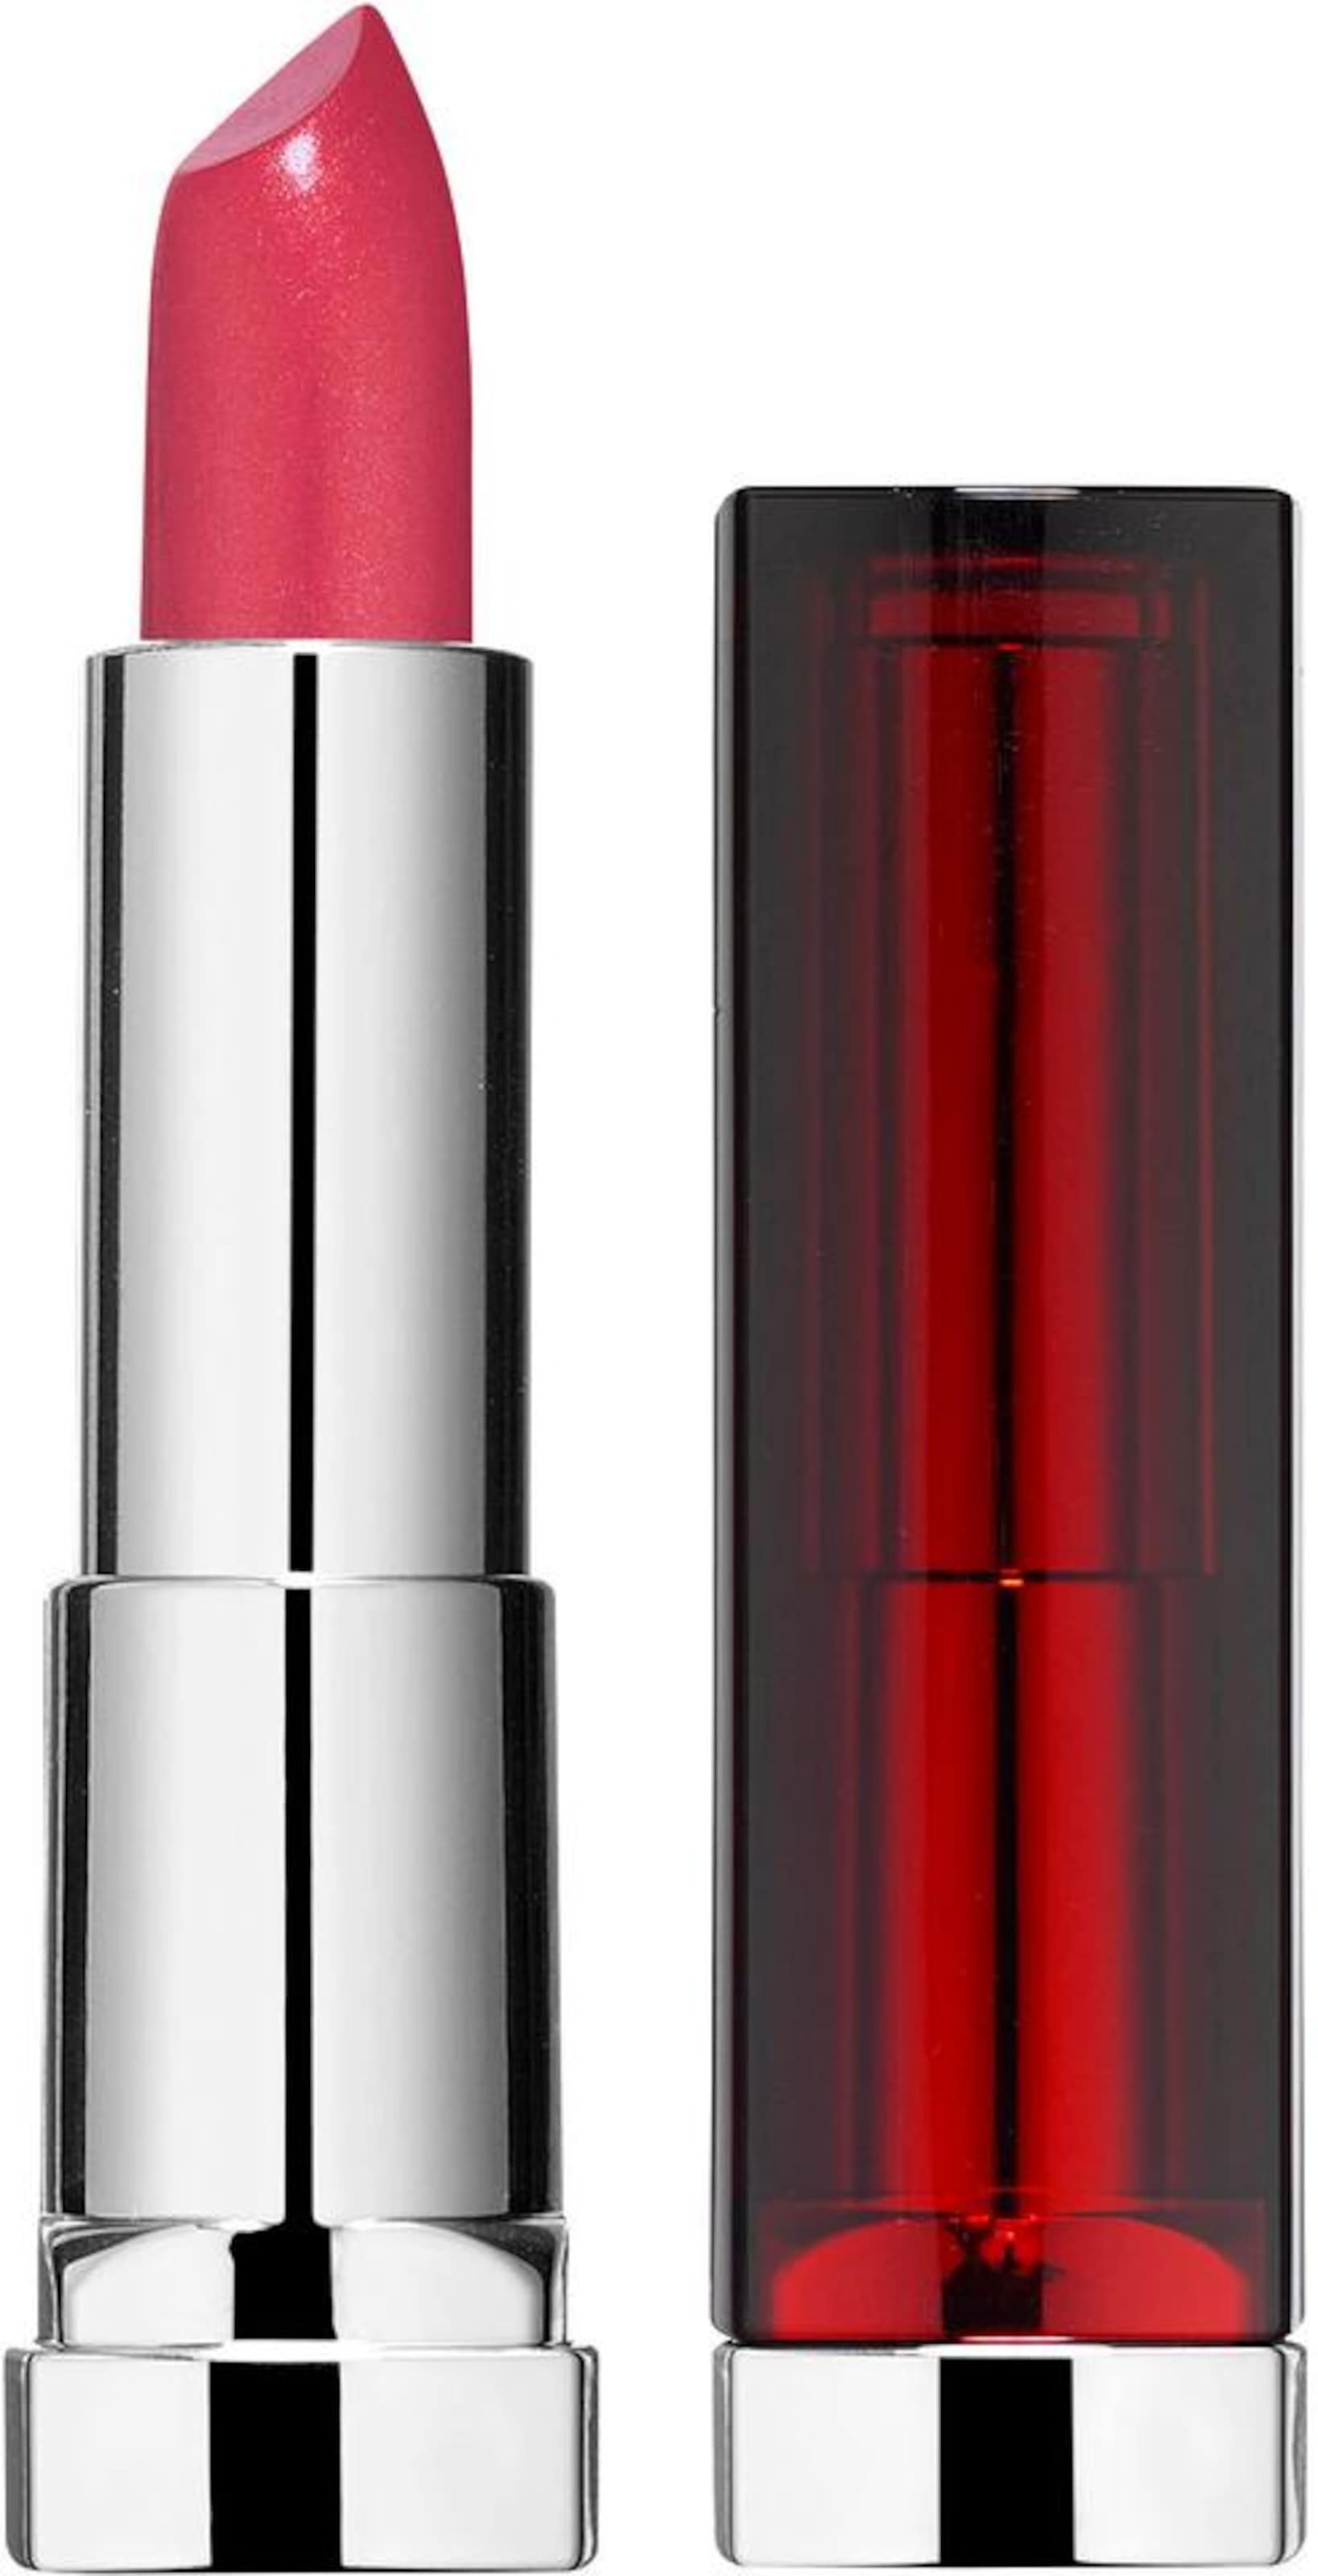 Blushed Sensational Pink Color Lippenstift In 'lippenstift York Maybelline New Nudes' bf7g6yvY